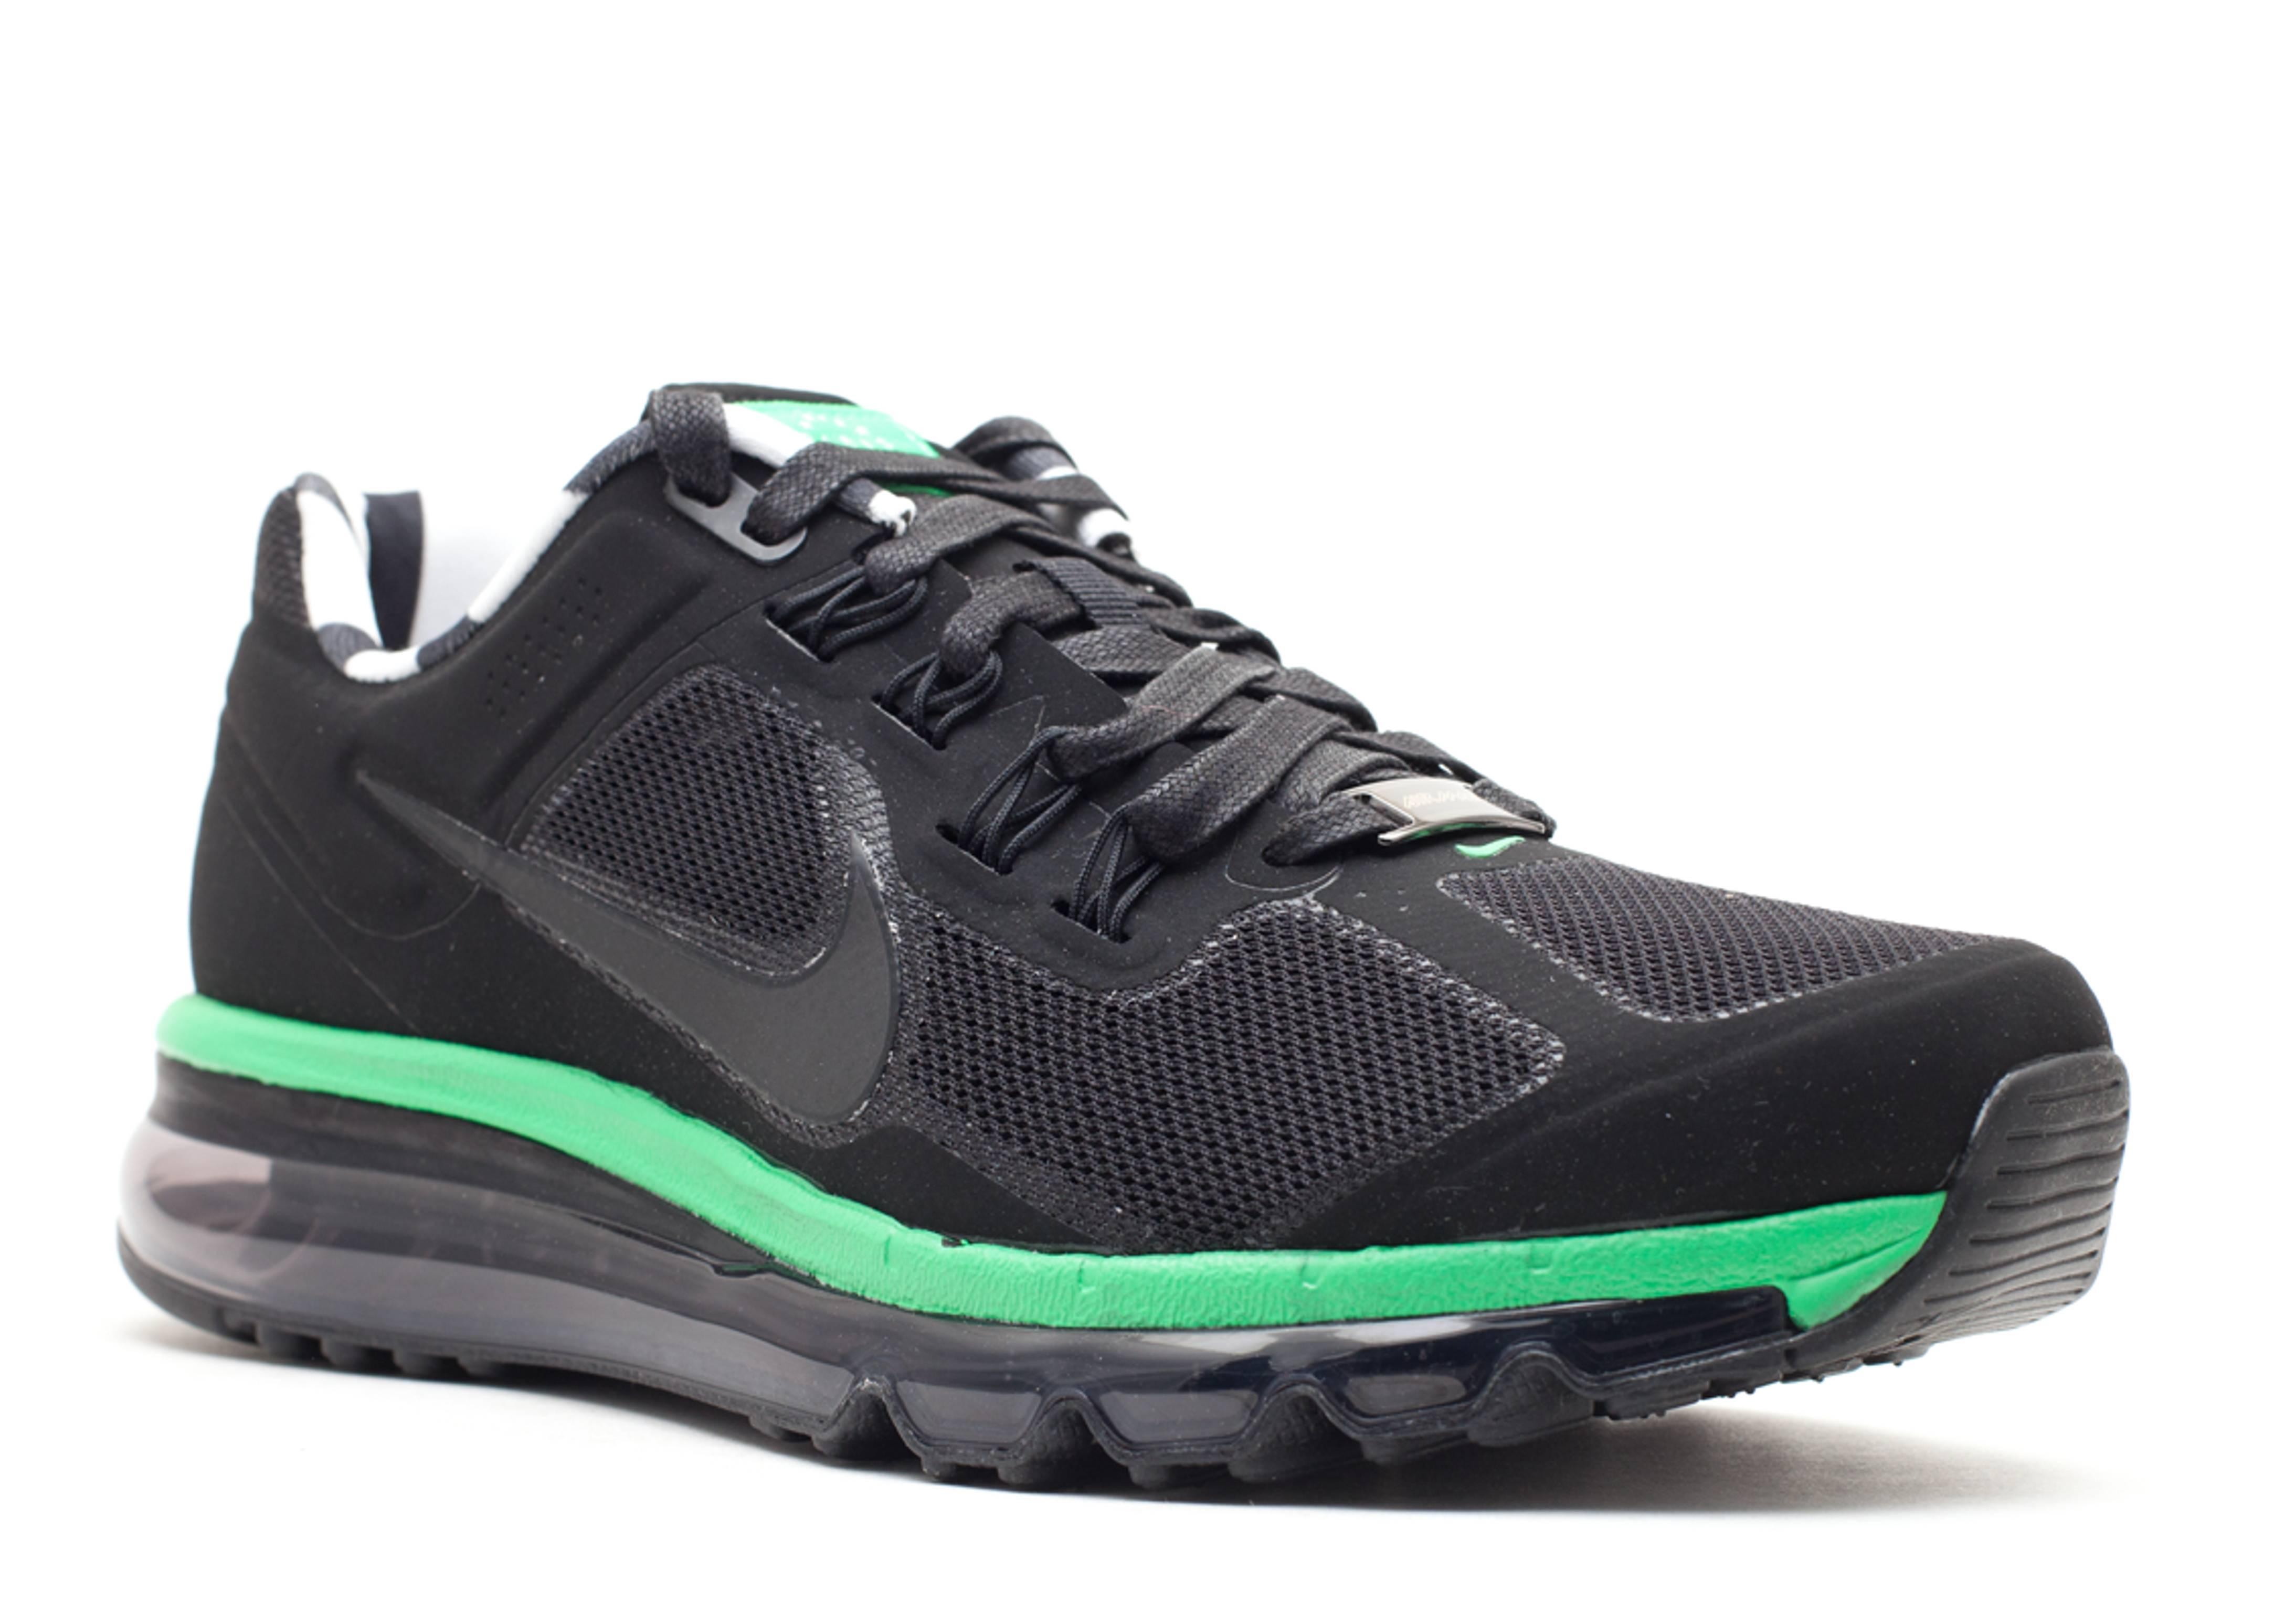 Nike Air Max 2013 Mens Apple Green Black Running Shoes